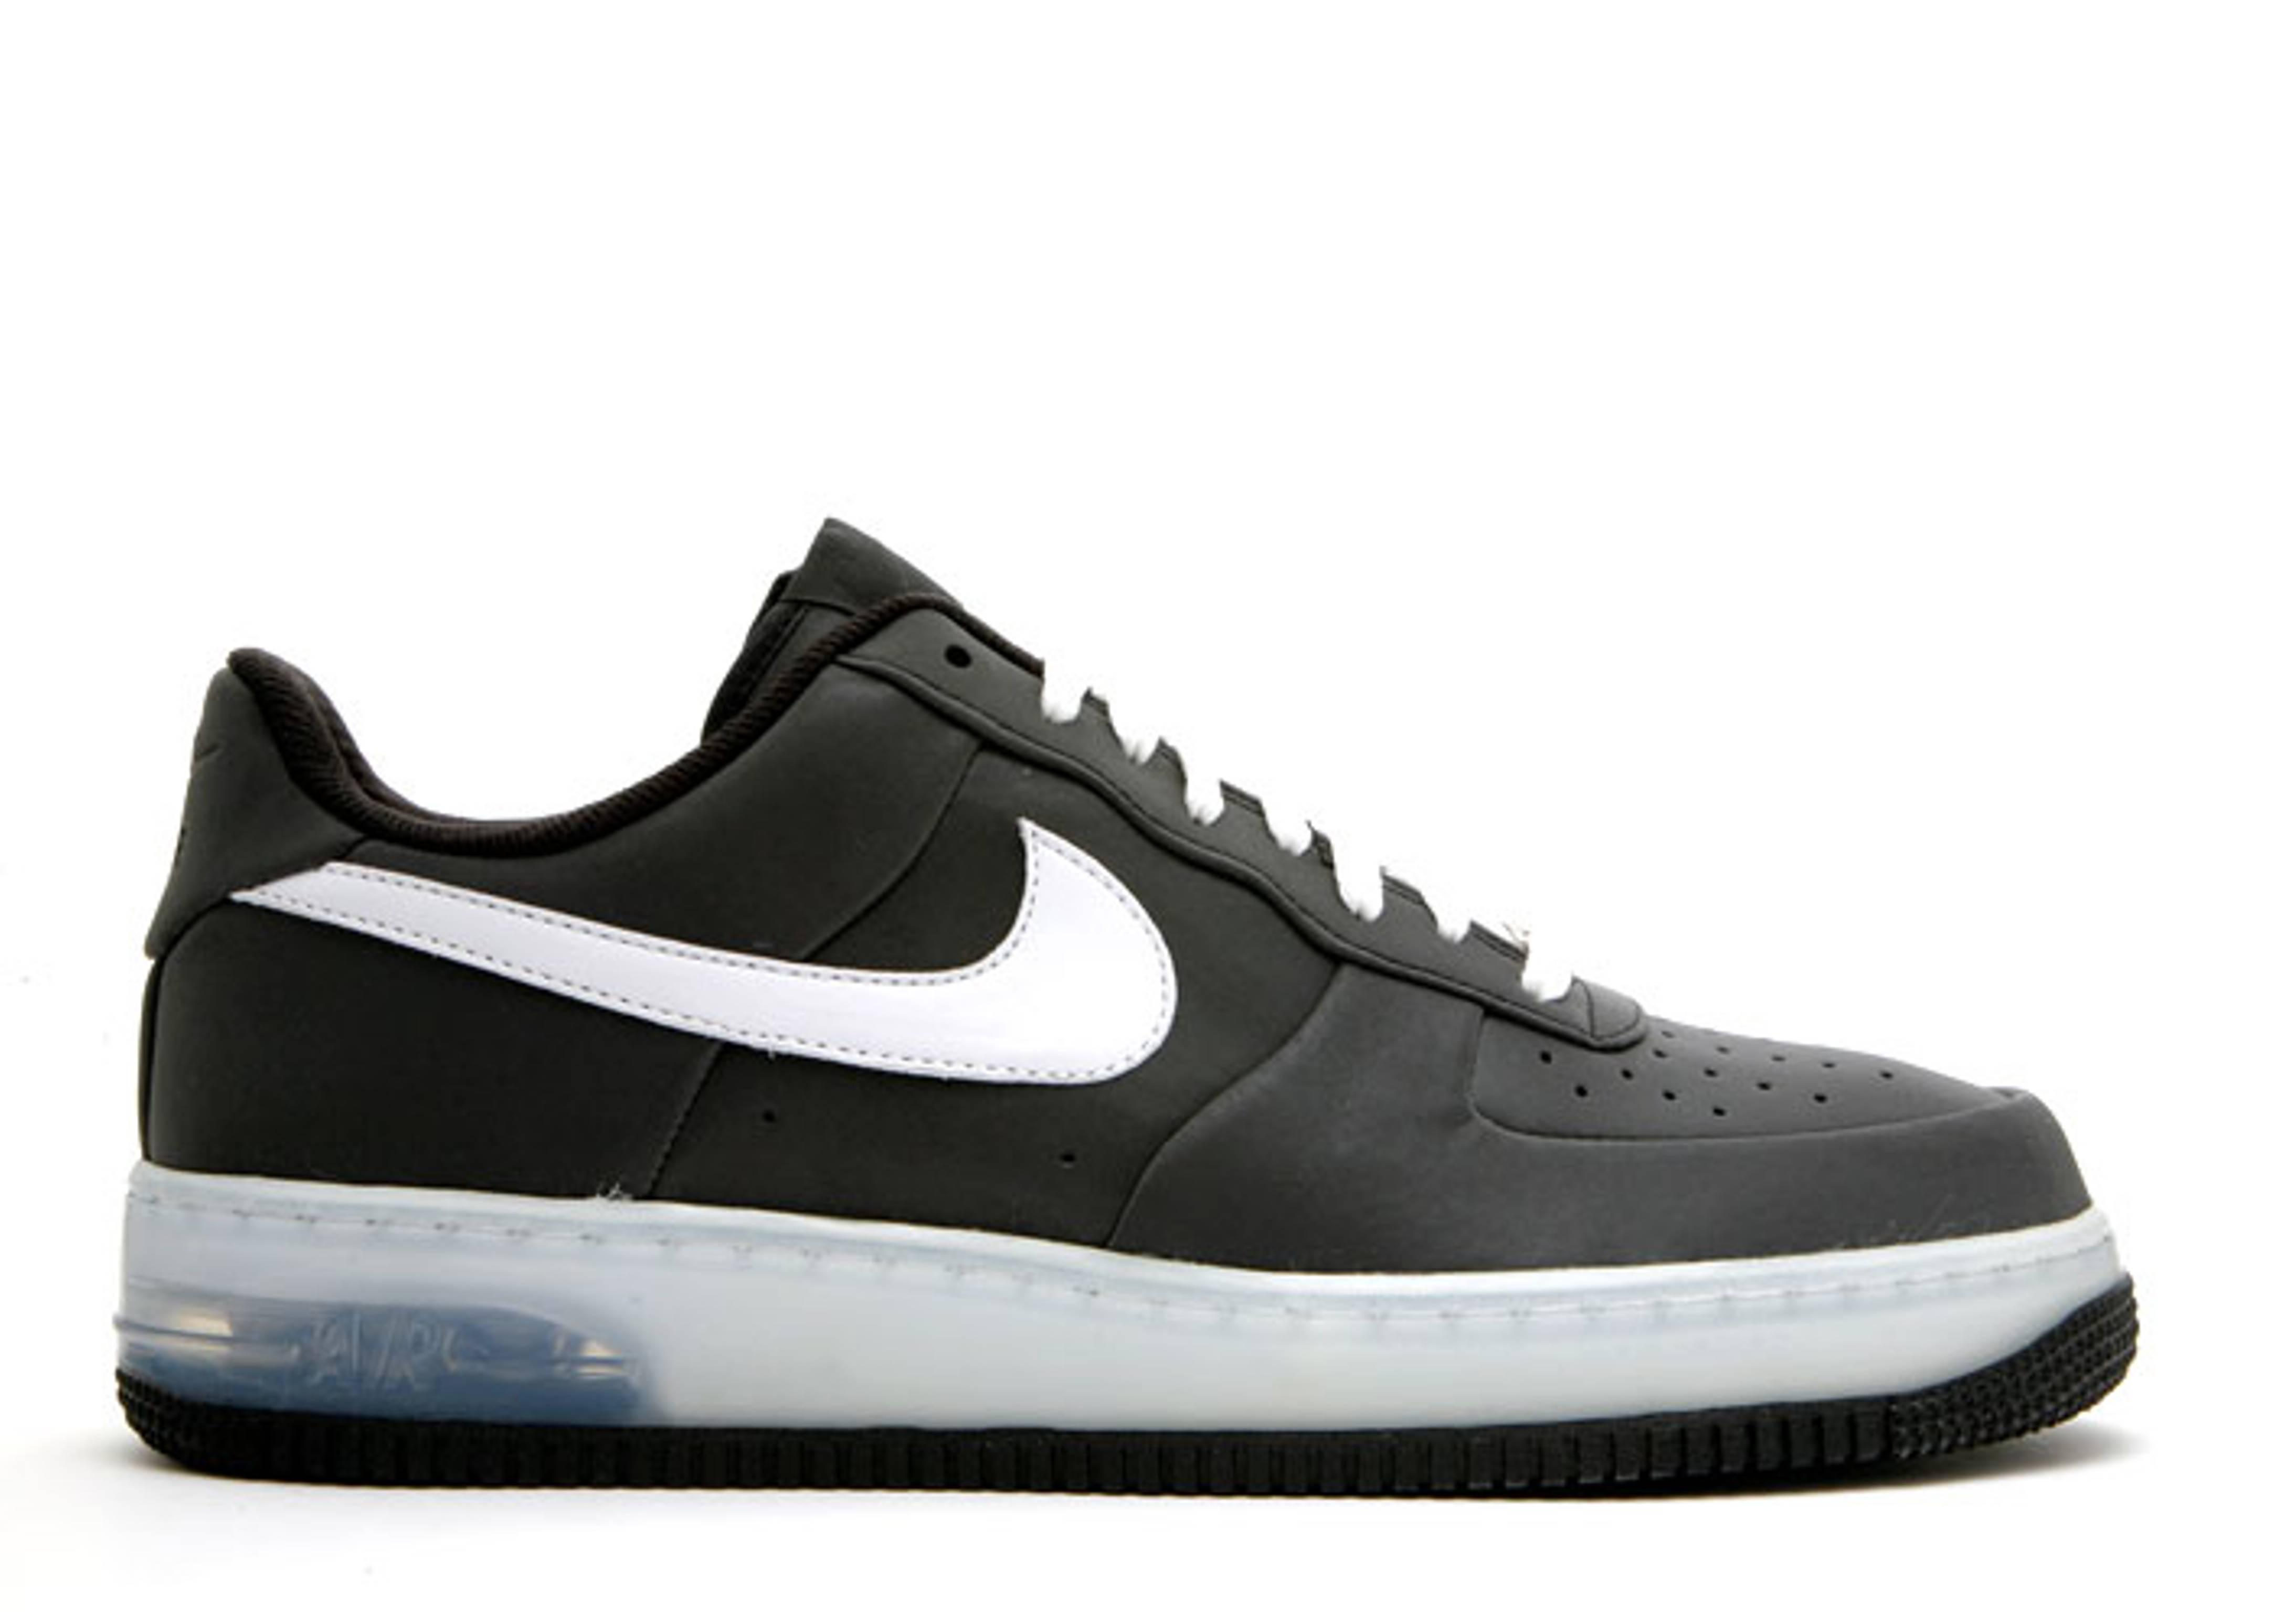 Nike Air Force 1 Supreme Max Air 3M Black White,nike shoes